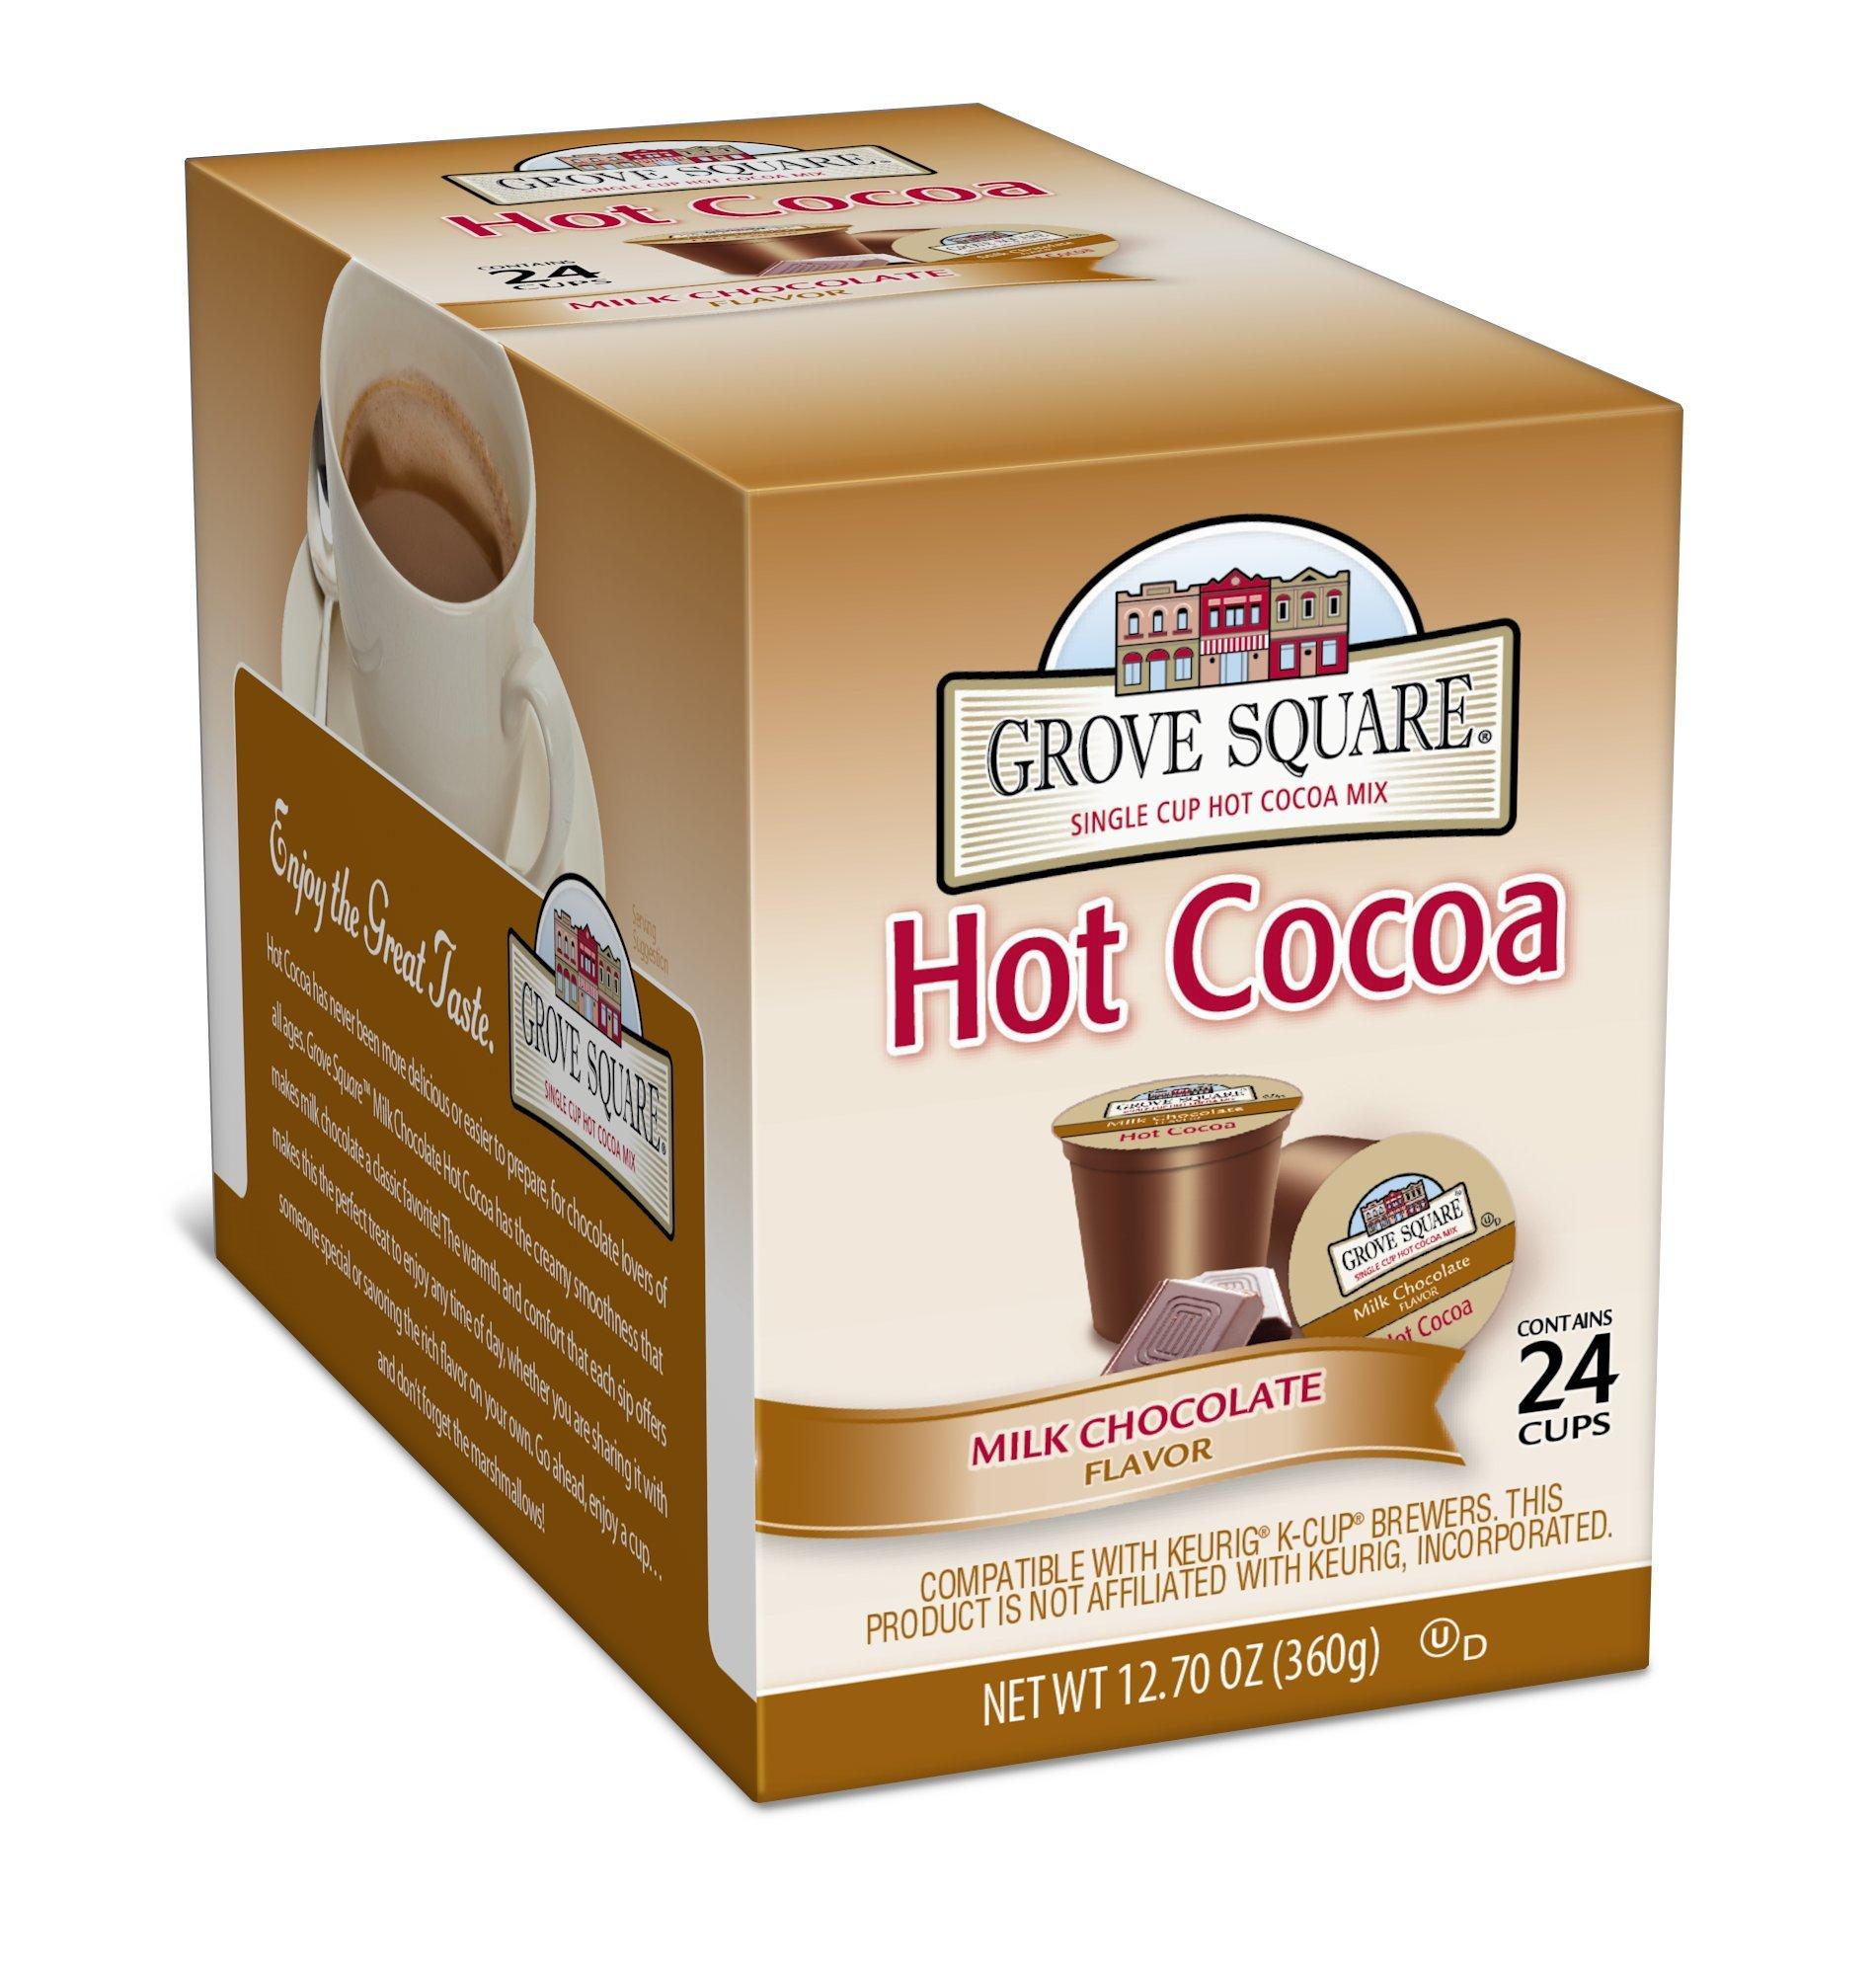 Grove Square Hot Cocoa Milk Chocolate 24 Single Serve Cups 24 Count 10